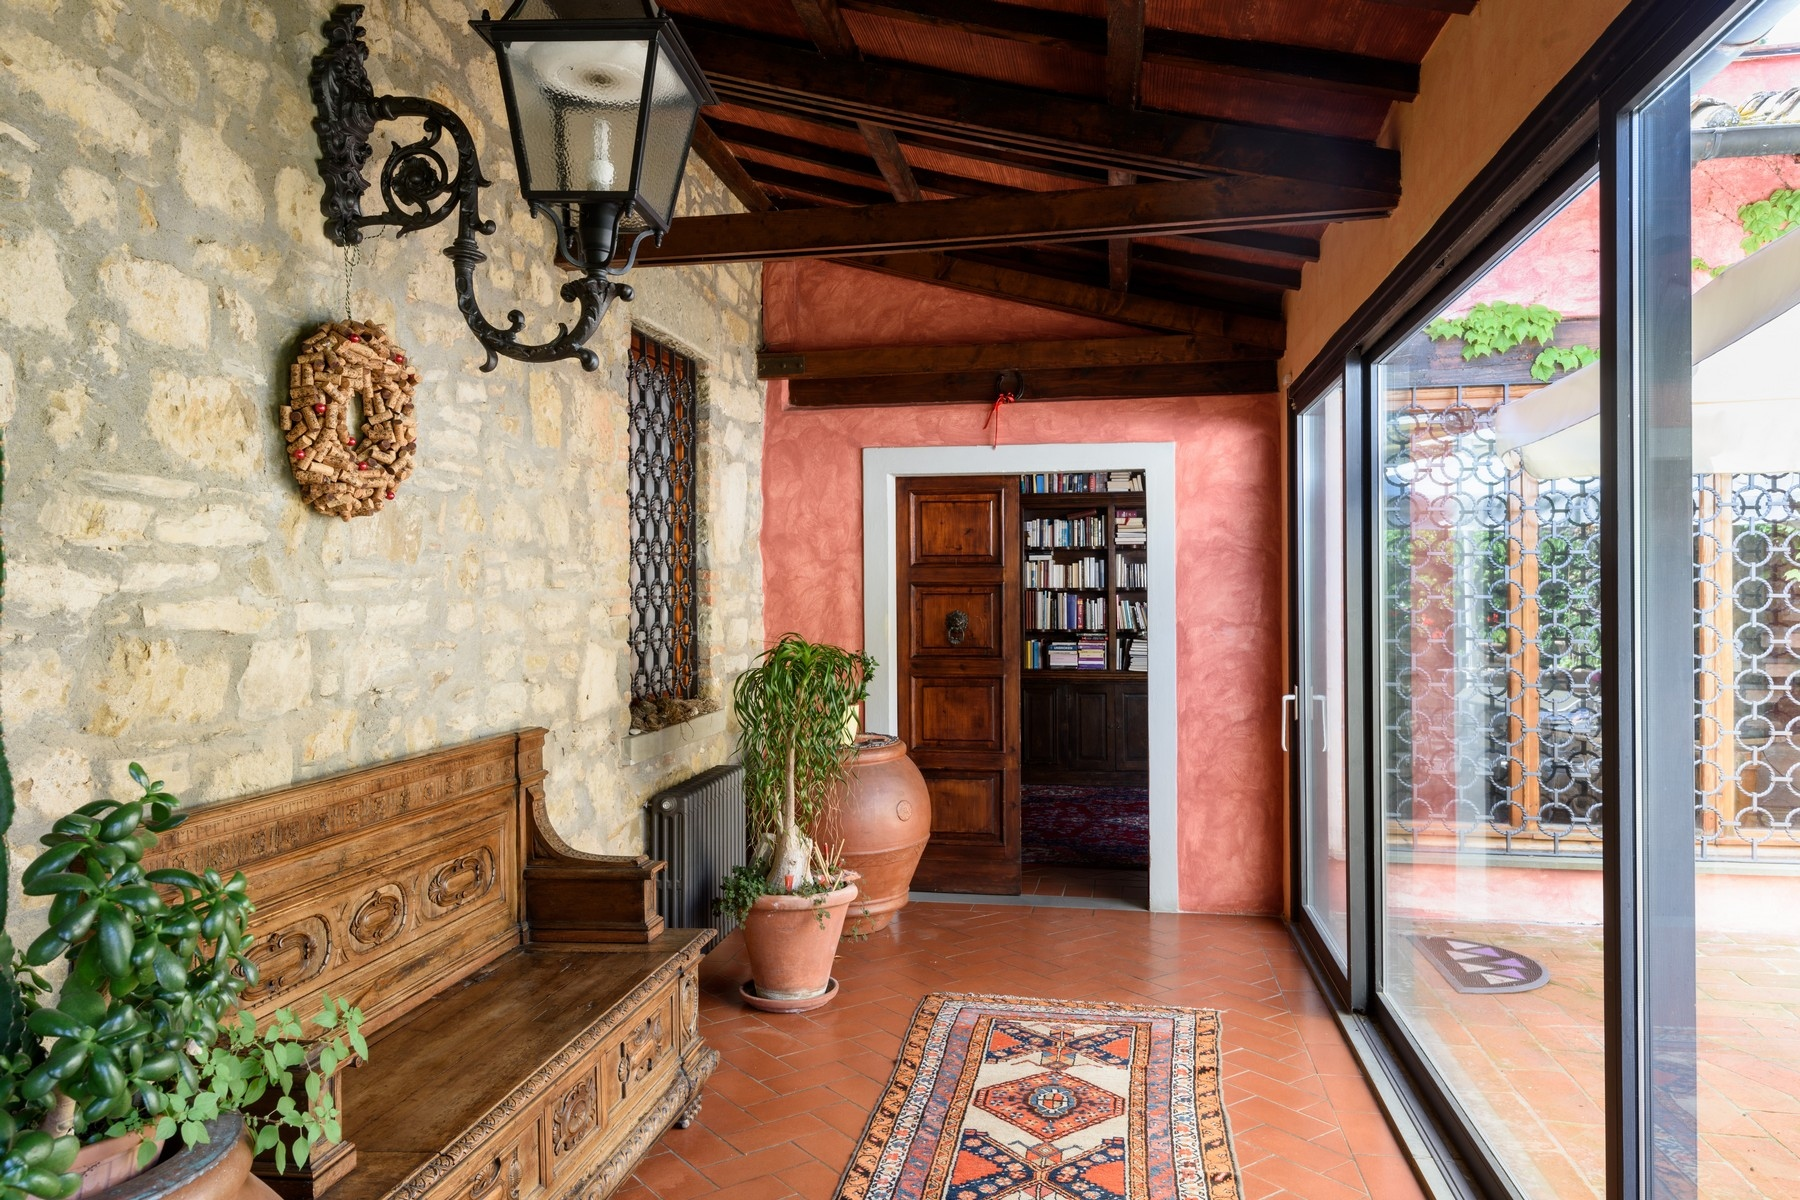 Villa in Vendita a Greve In Chianti: 5 locali, 491 mq - Foto 8